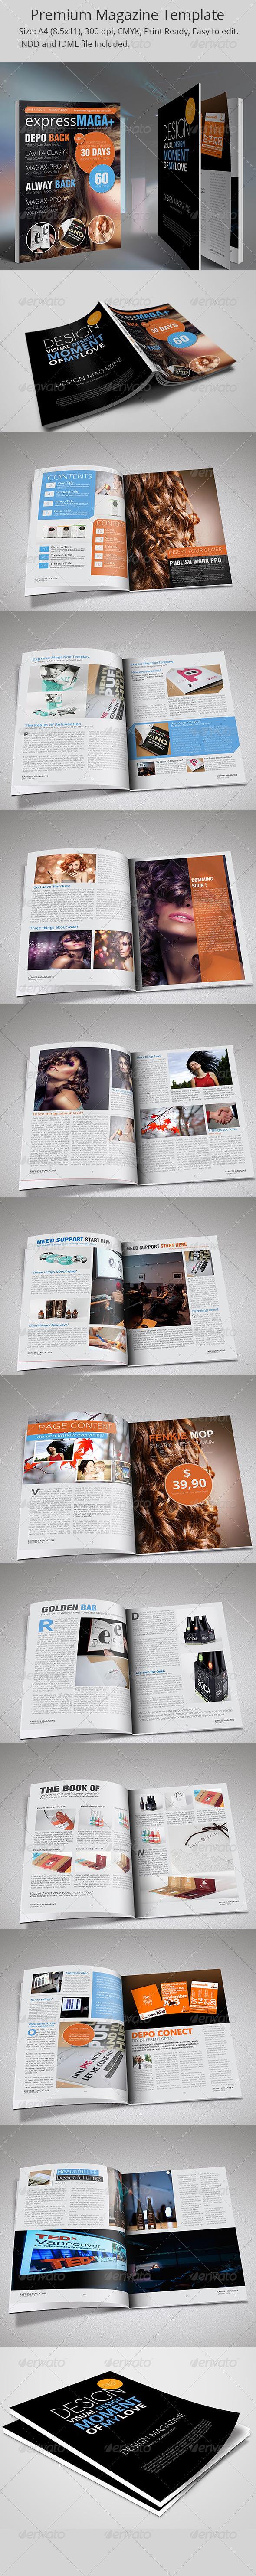 Magazine ExpressMaga Template - Magazines Print Templates